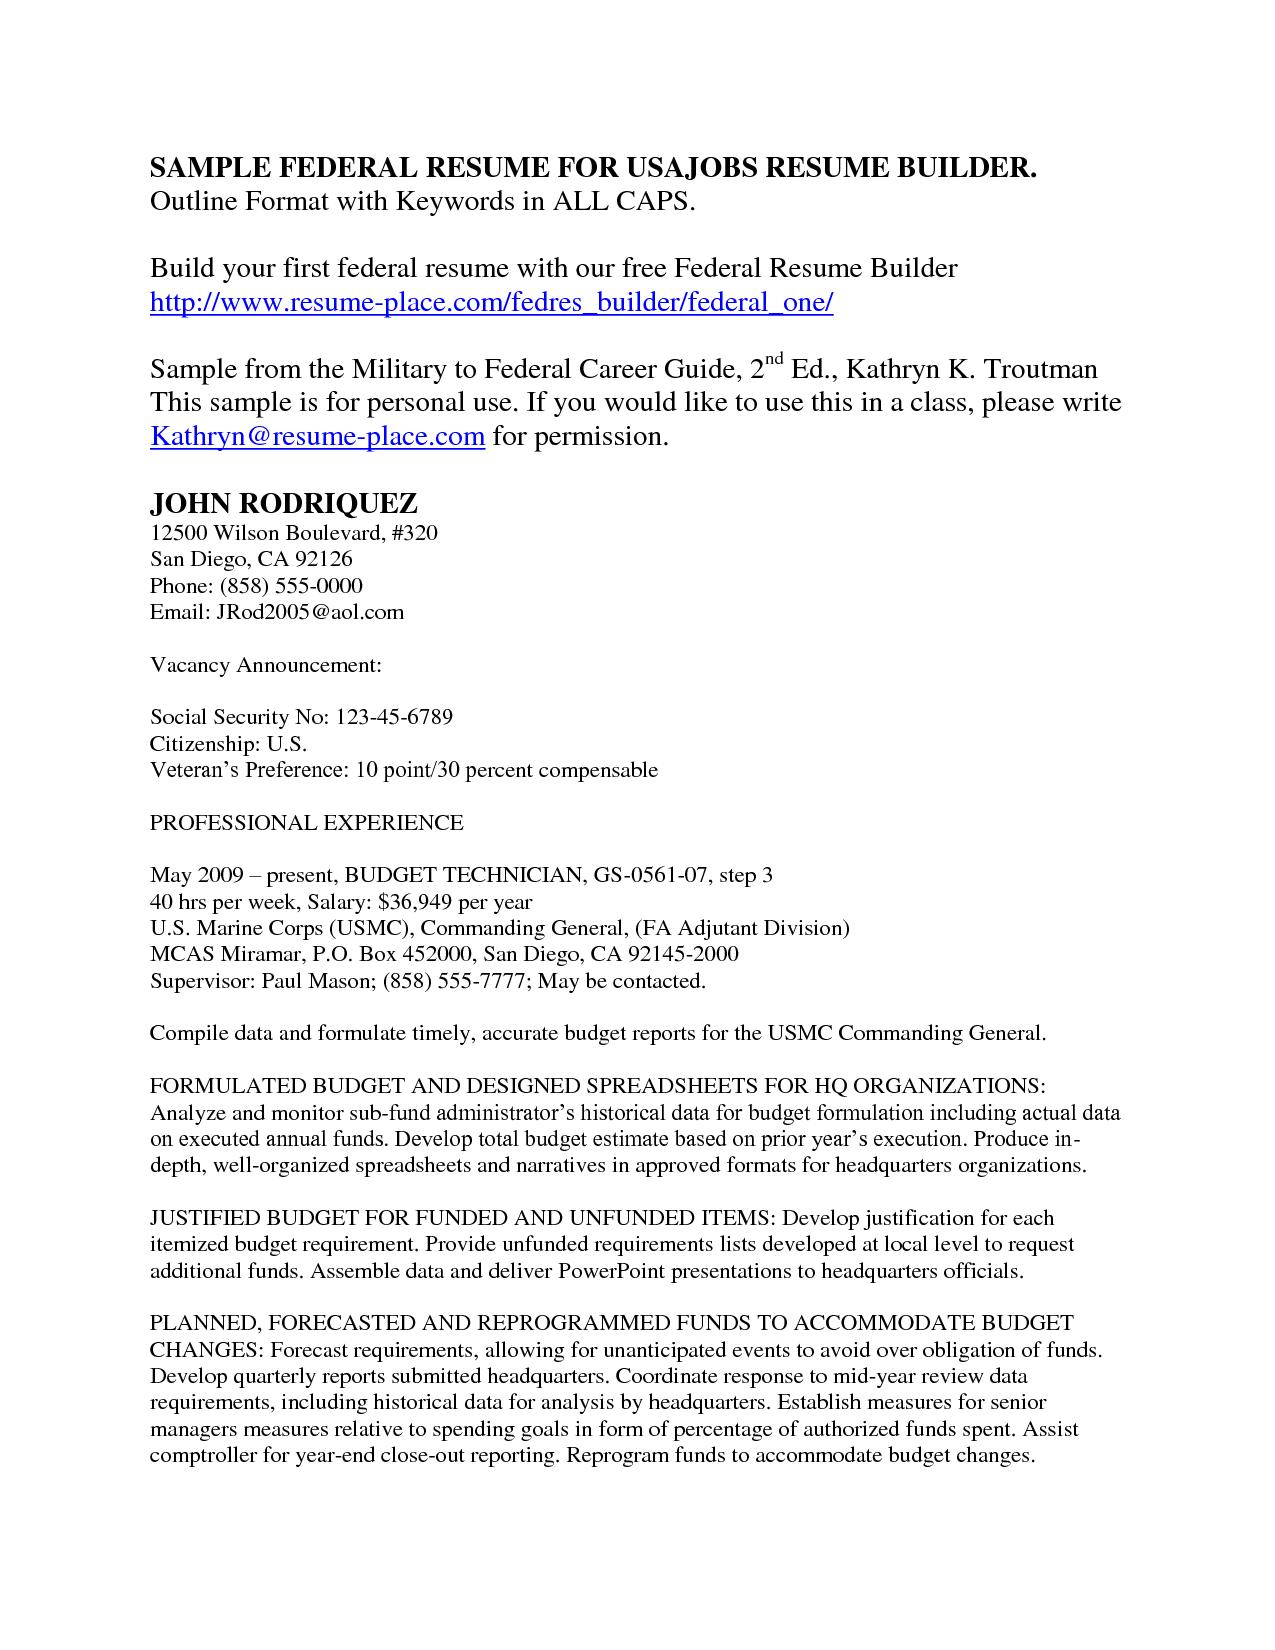 Resume Templates For Usa Jobs